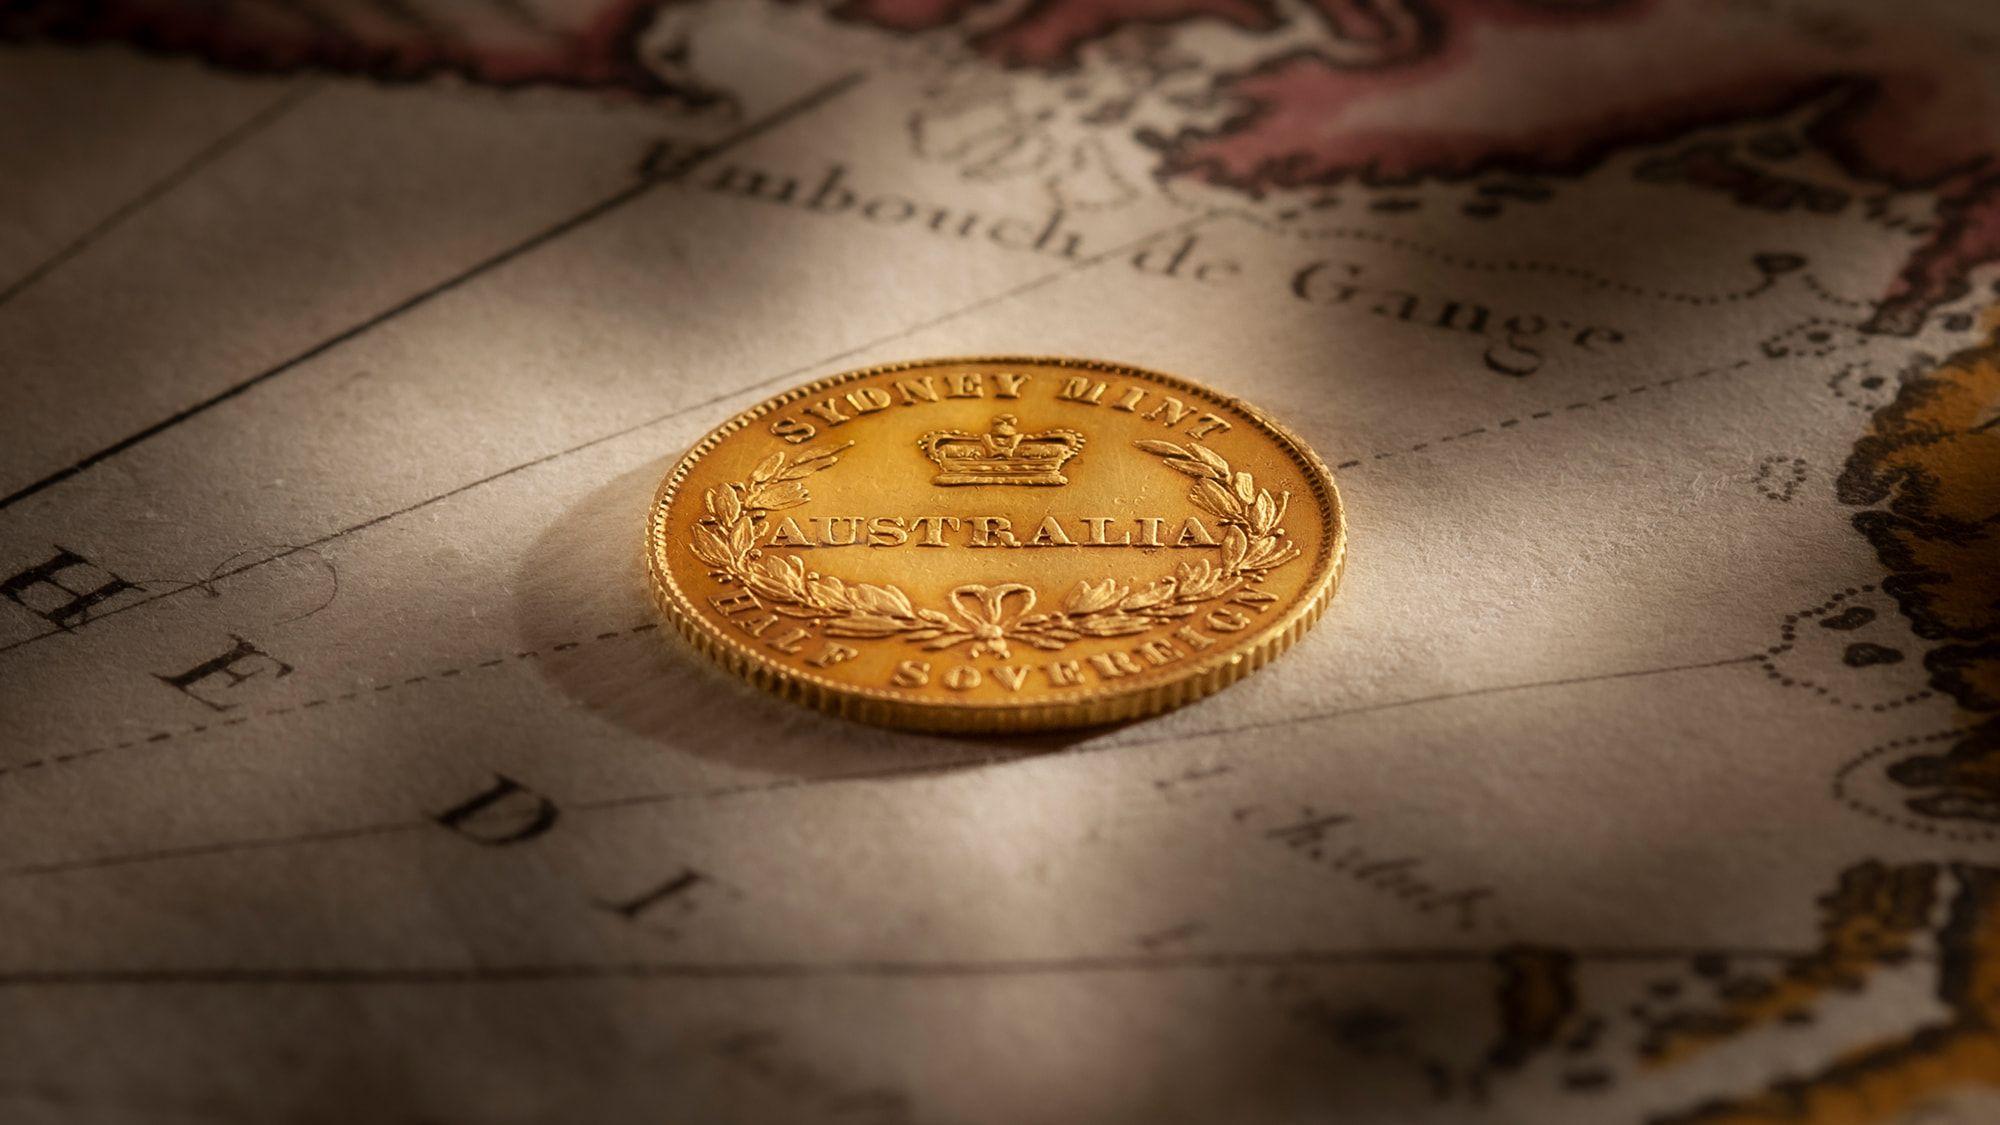 1855-Sydney-Mint-Half-Sovereign-Rev-EF-Improved-Background-January-2021